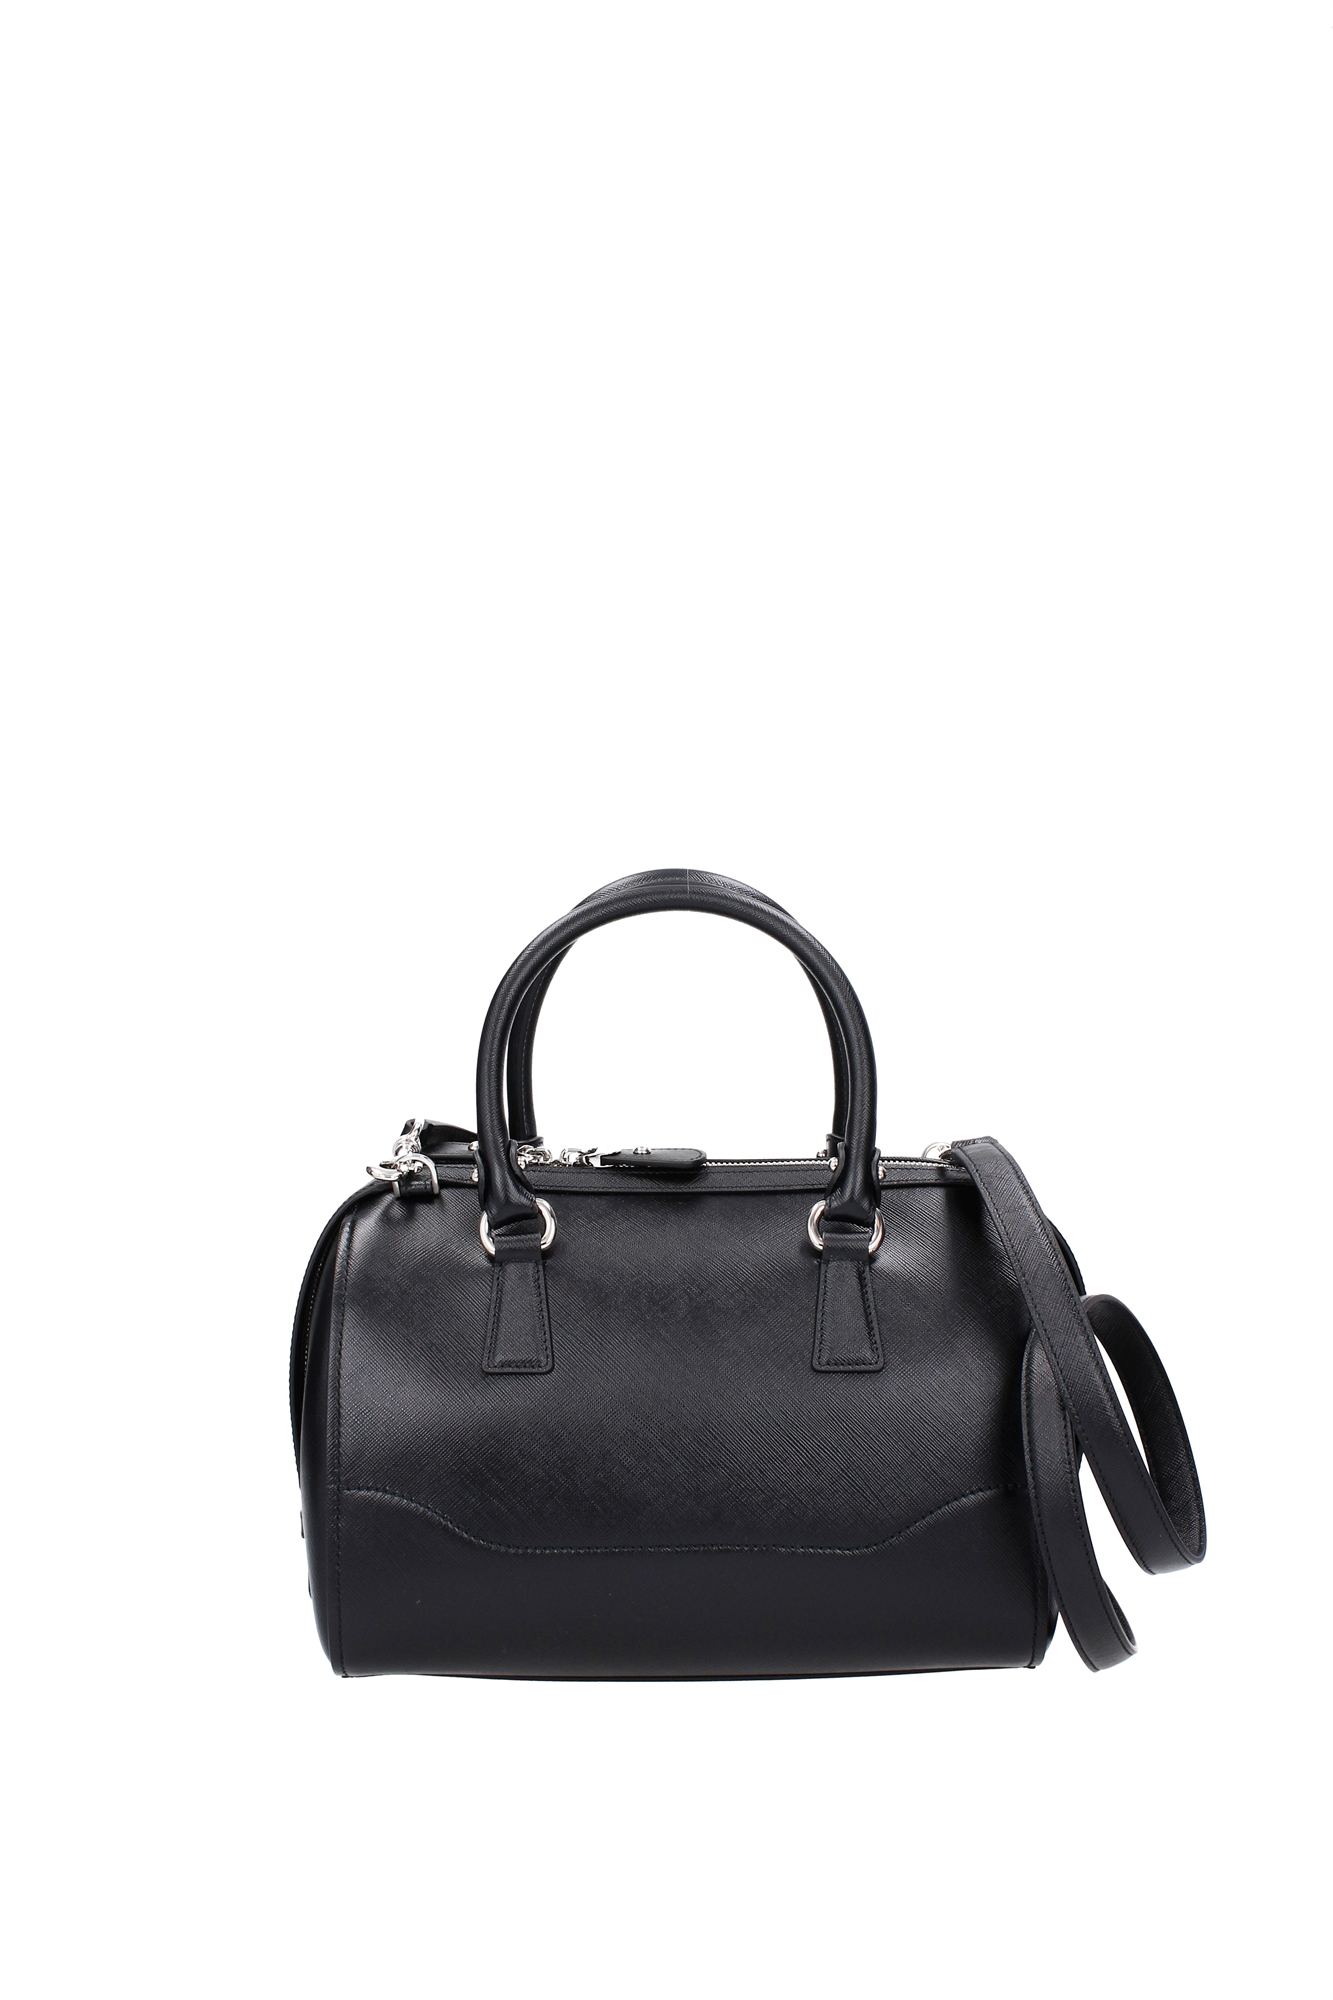 ... Bags Salvatore Ferragamo Women Leather Black 21F869060649973 - eBay